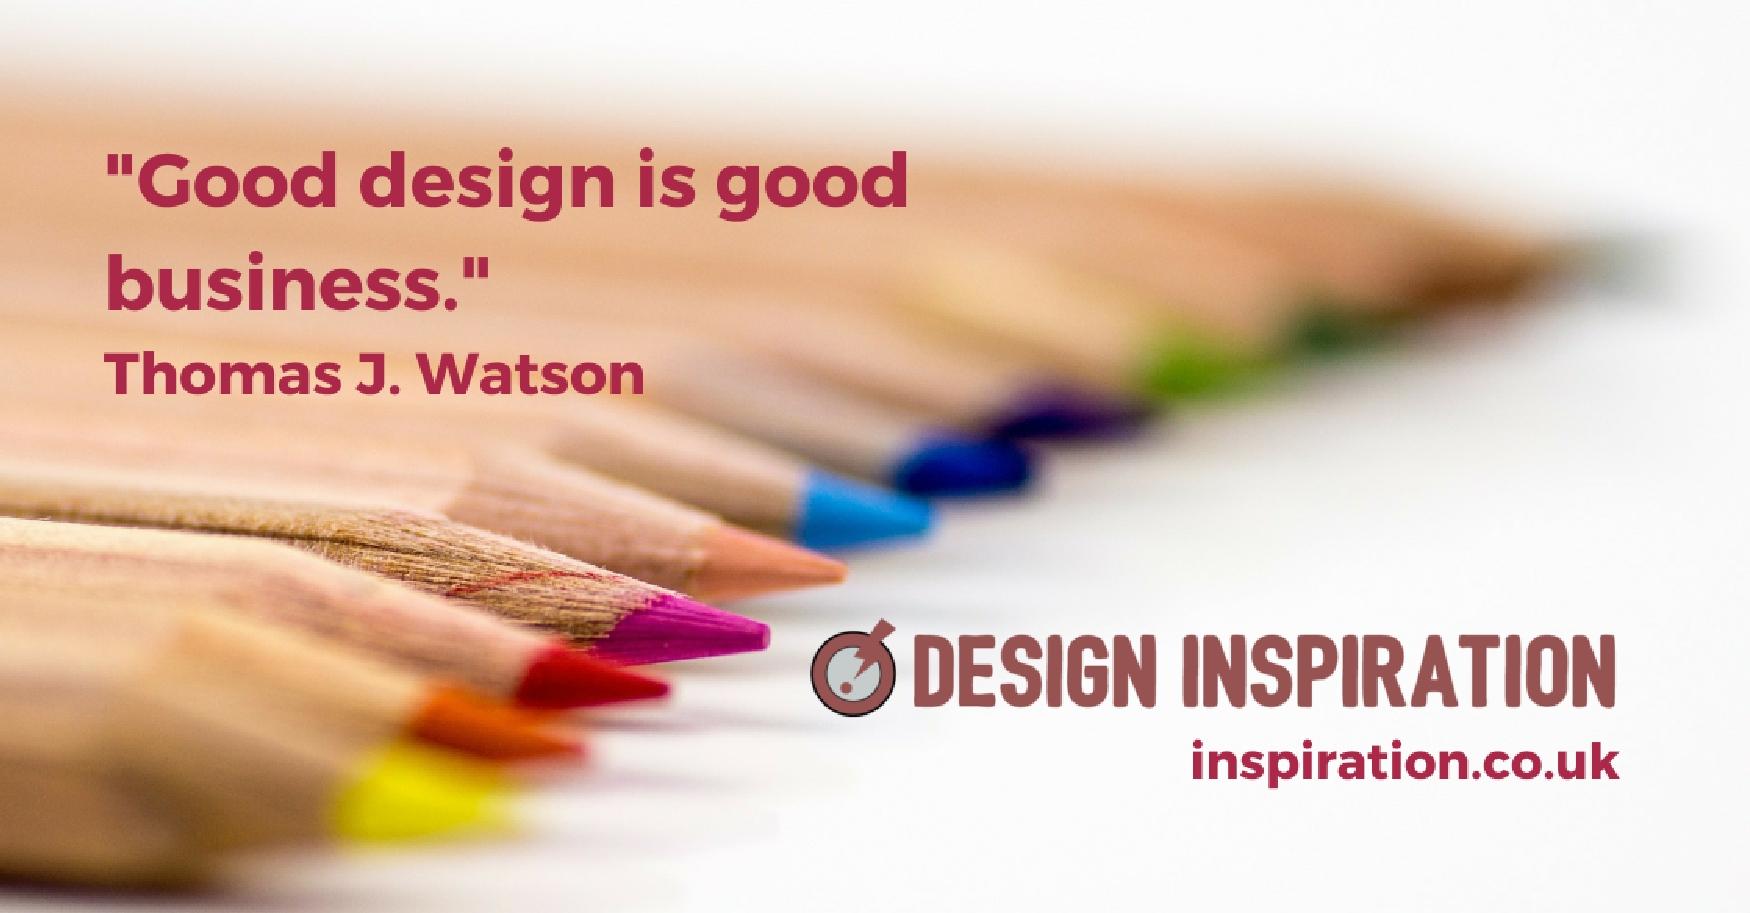 Good design is good business